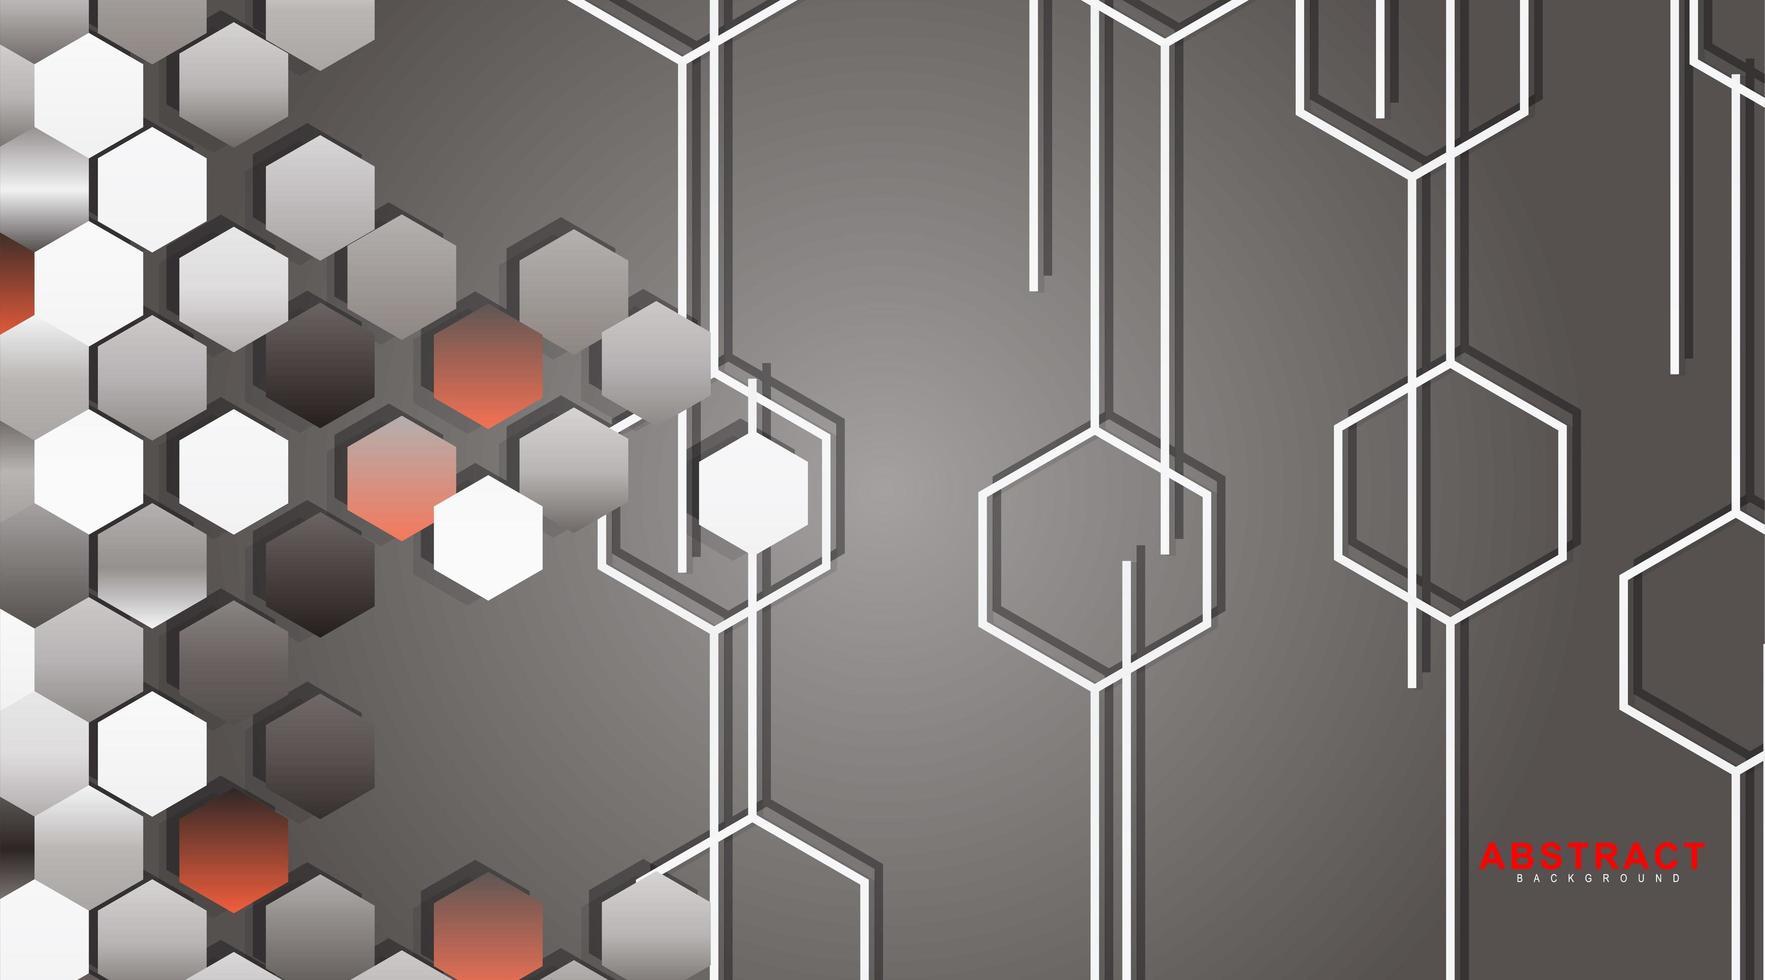 abstrakt vektor bakgrund av en sexkantig geometrisk vägg